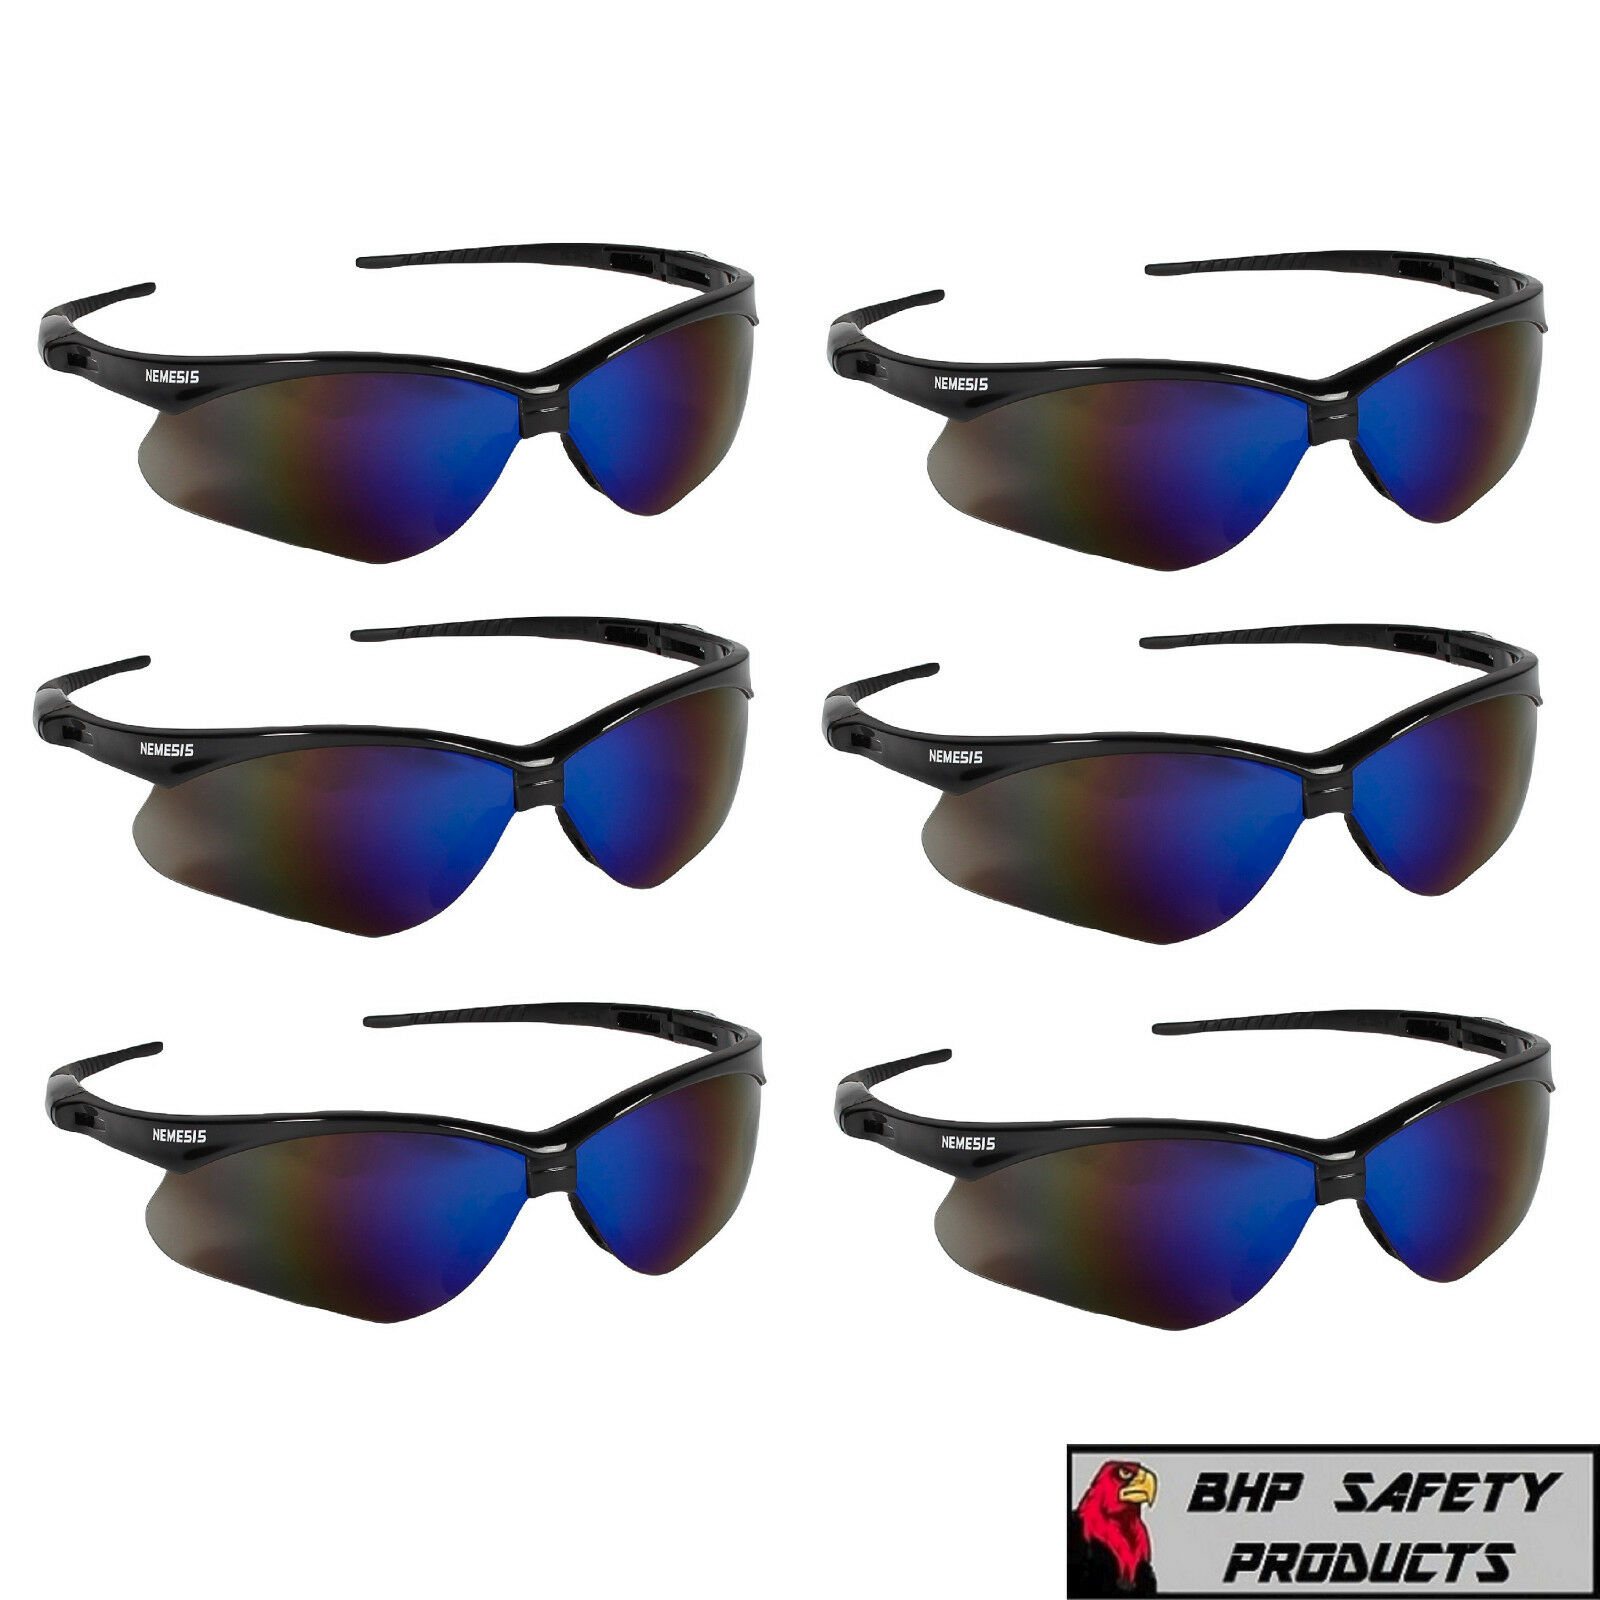 (6 PAIR) JACKSON NEMESIS SAFETY GLASSES BLACK FRAME BLUE MIRROR SUNGLASSES 14481